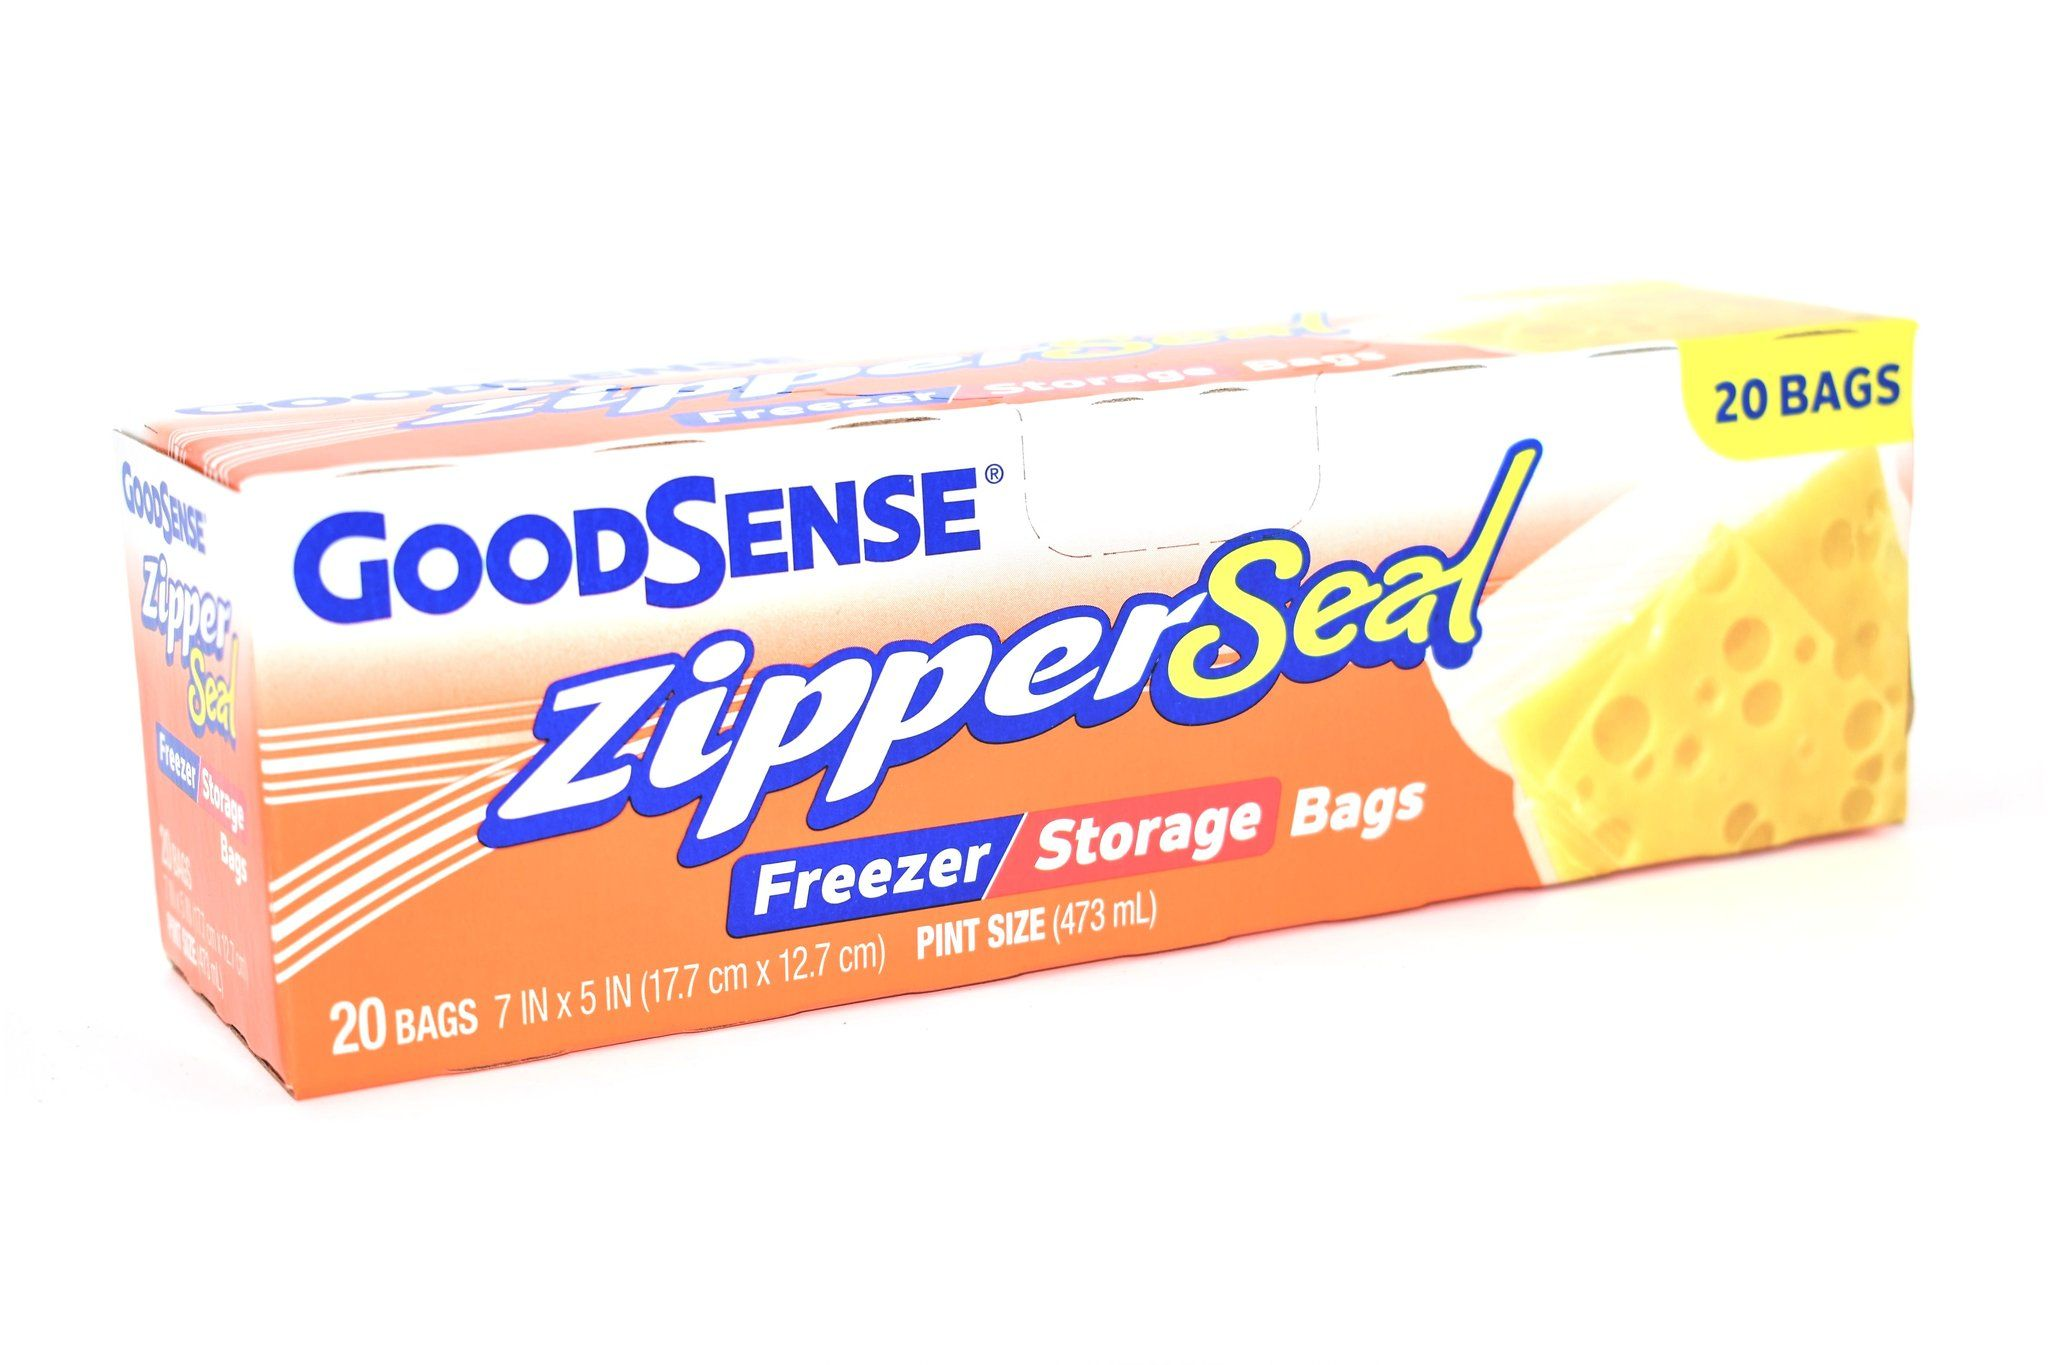 Goodsense Zipper Seal Pint Size Freezer Storage Bags 20